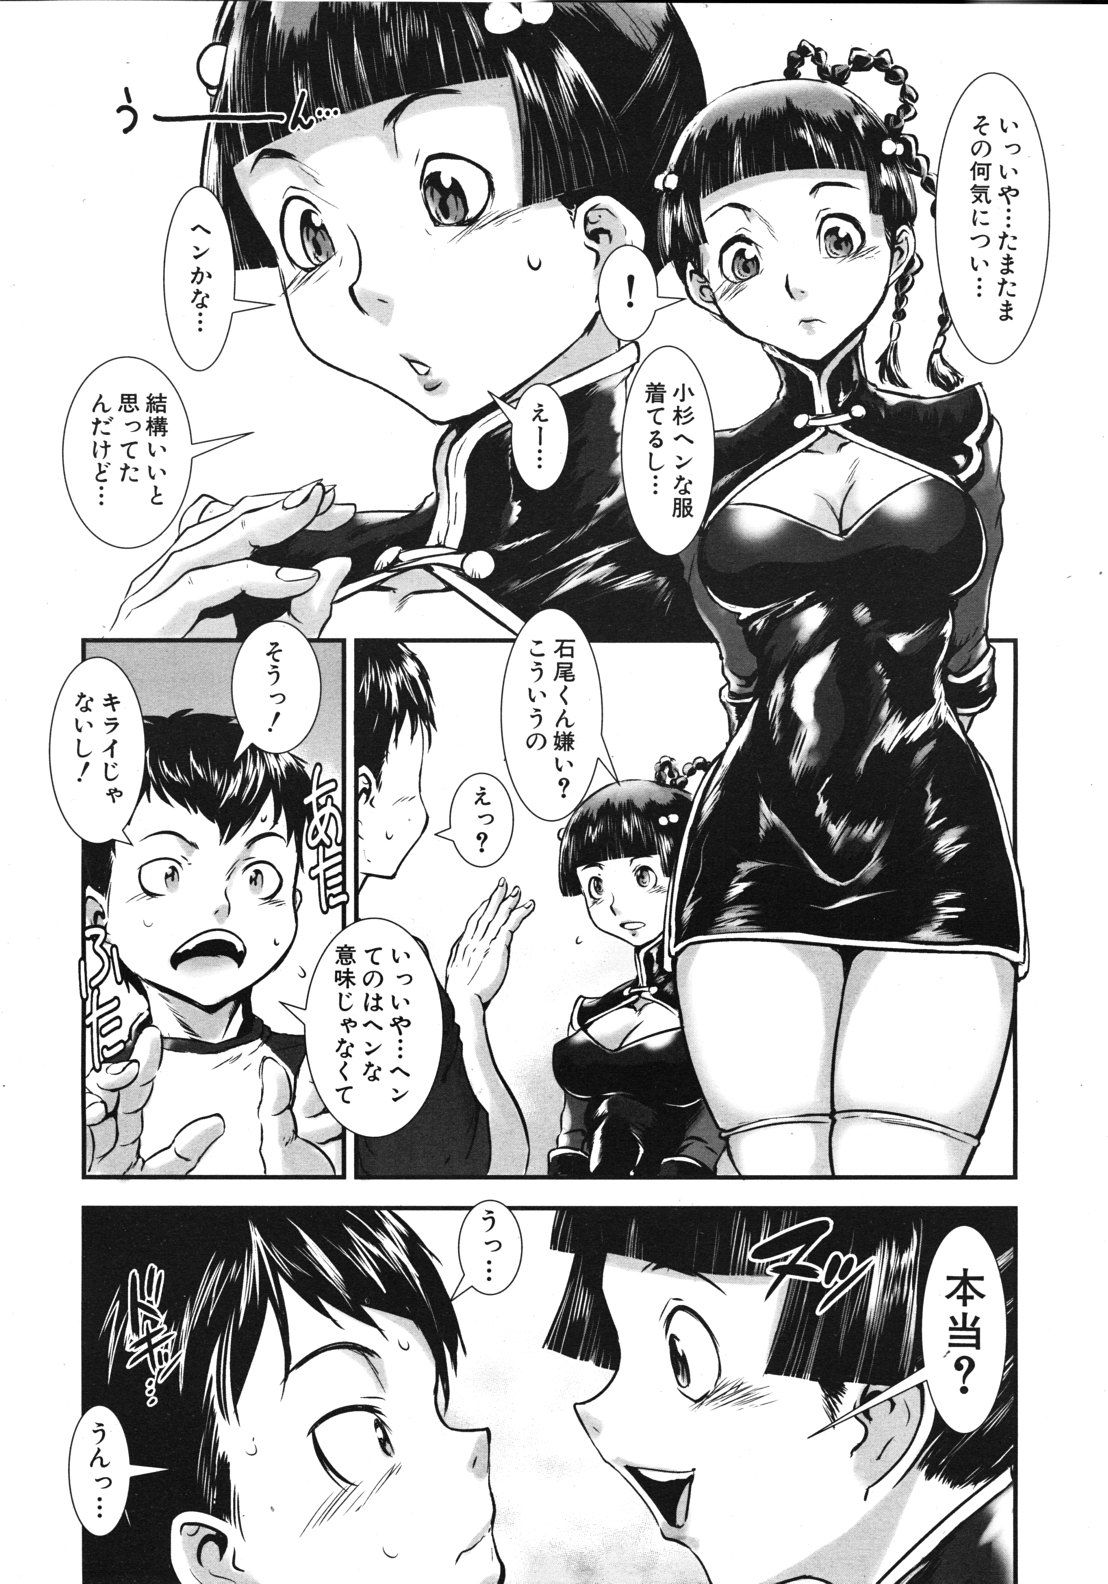 Shimotsuki Juugo (Noukyou) — Сборник хентай манги [Uncen] [JAP] Manga Hentai